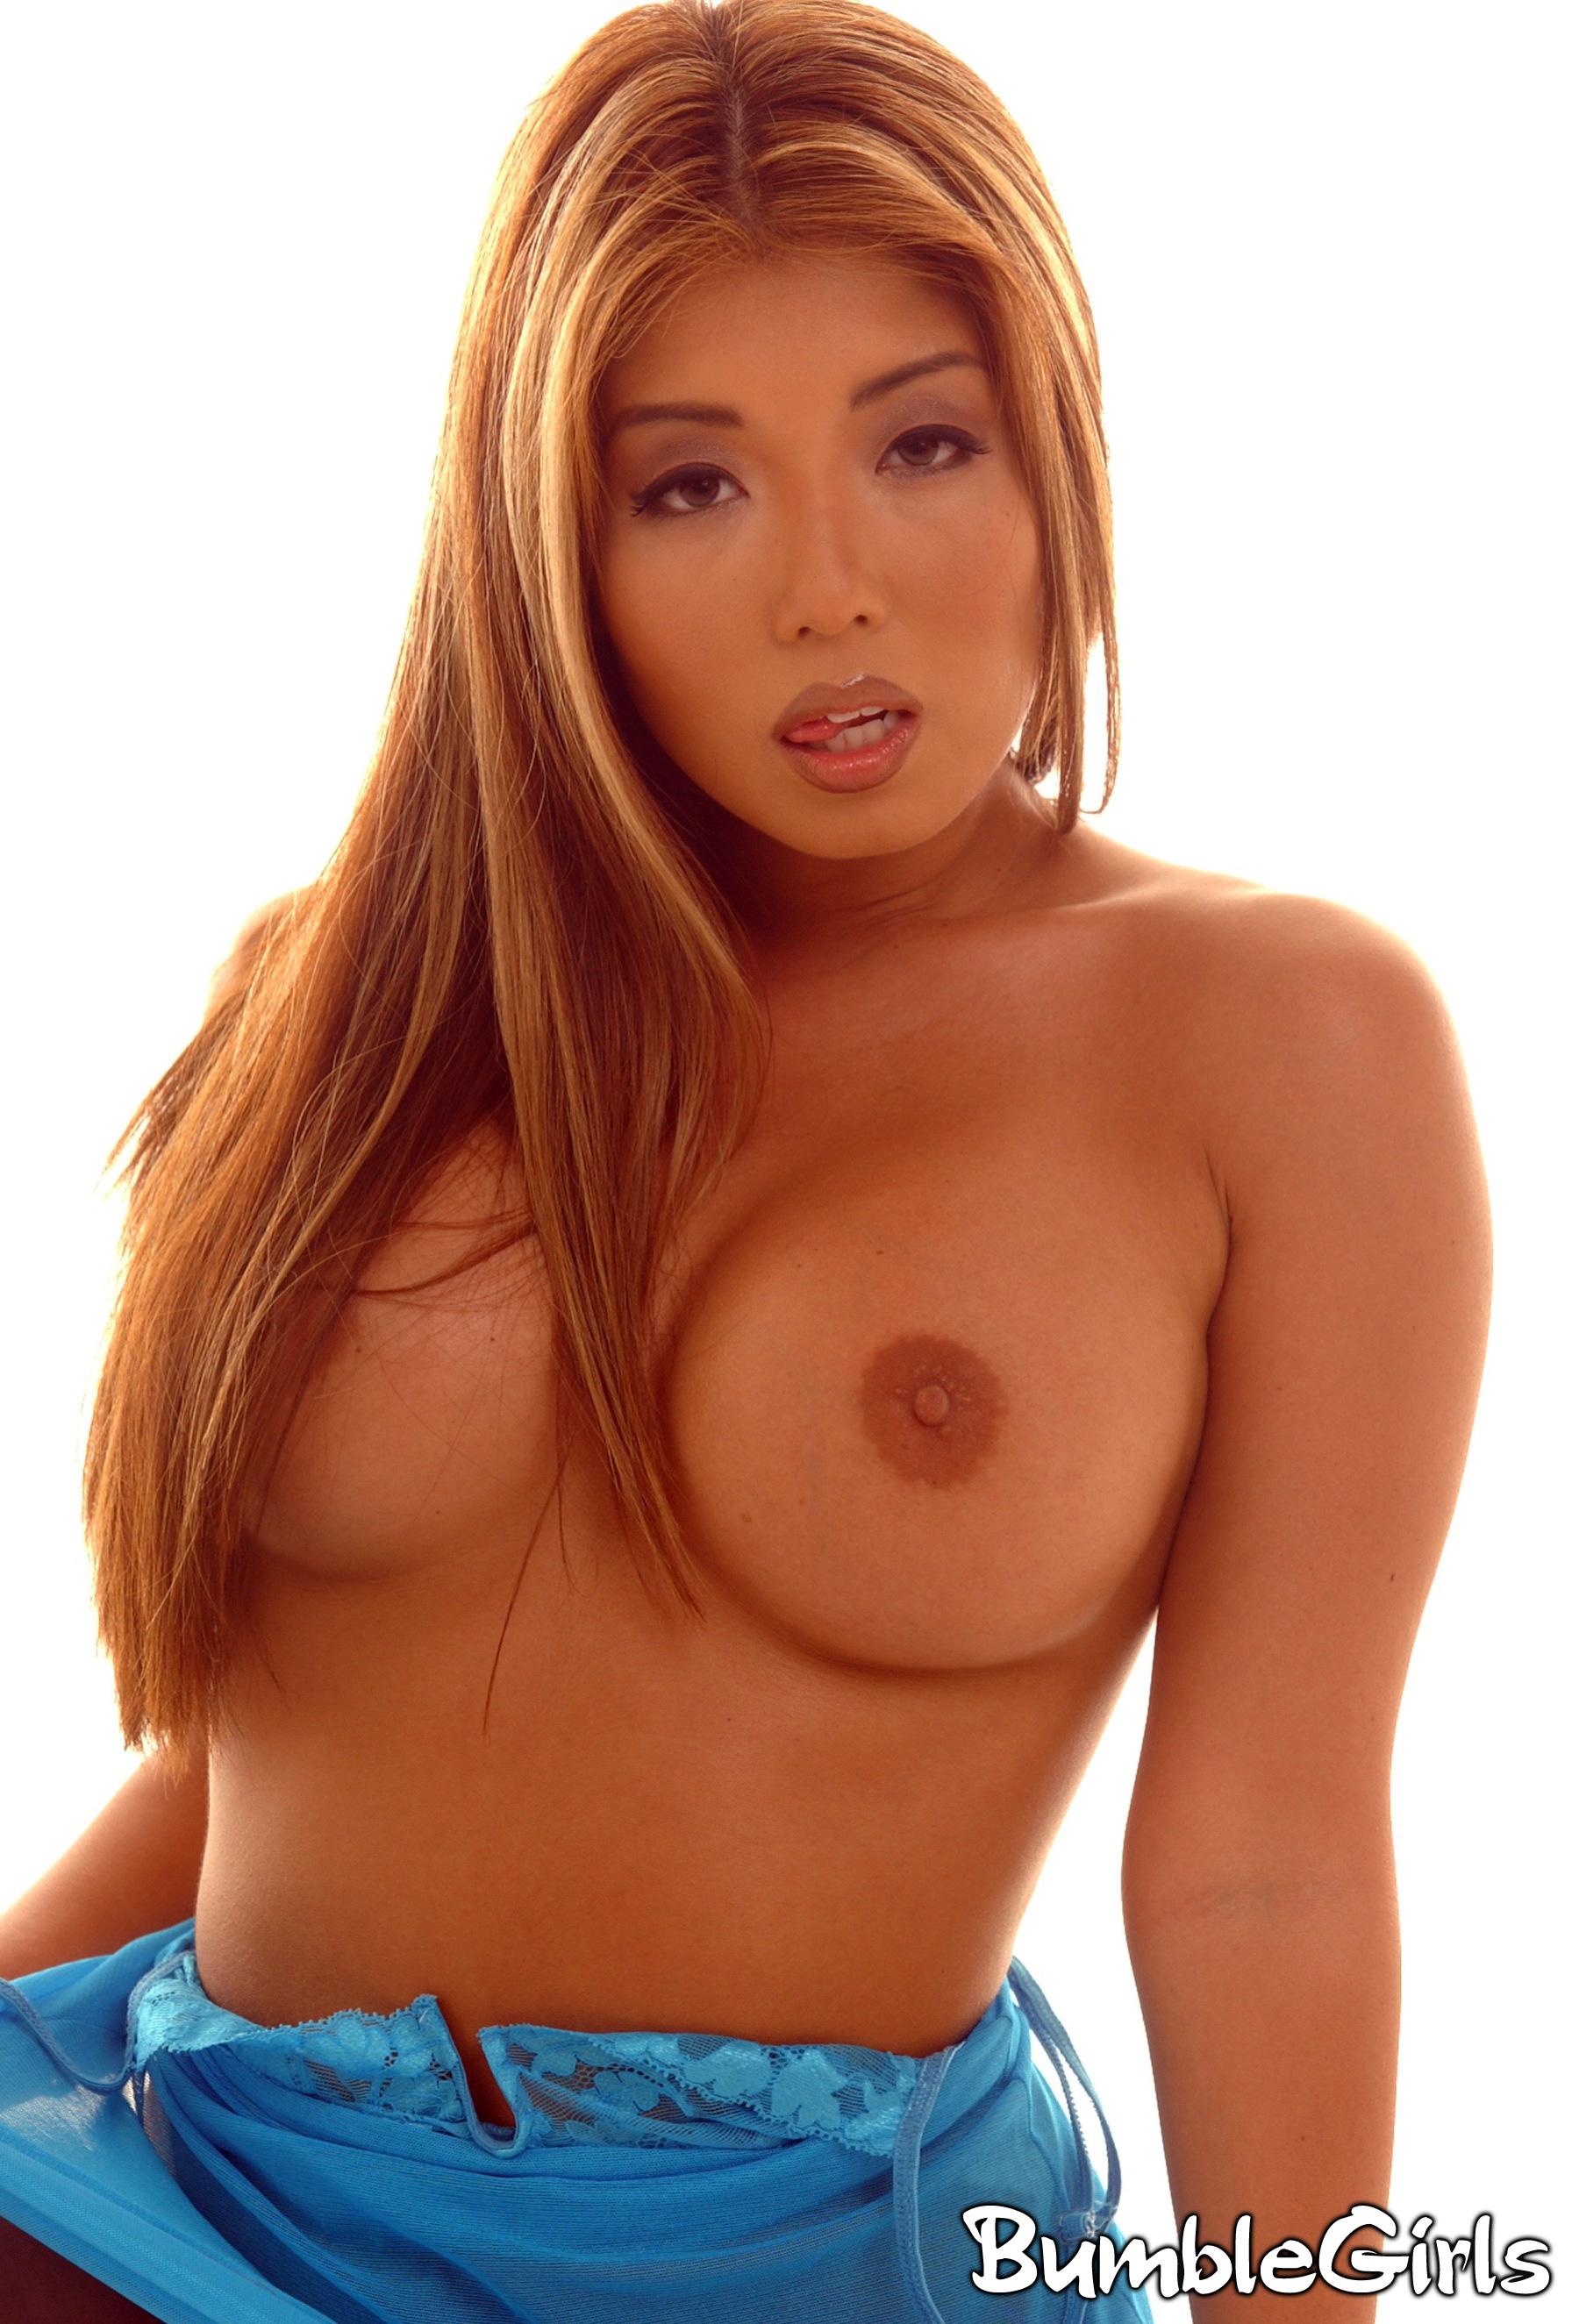 Abuelos Hd Xxx Porno mac and bumble akira lane 262776 - good sex porn